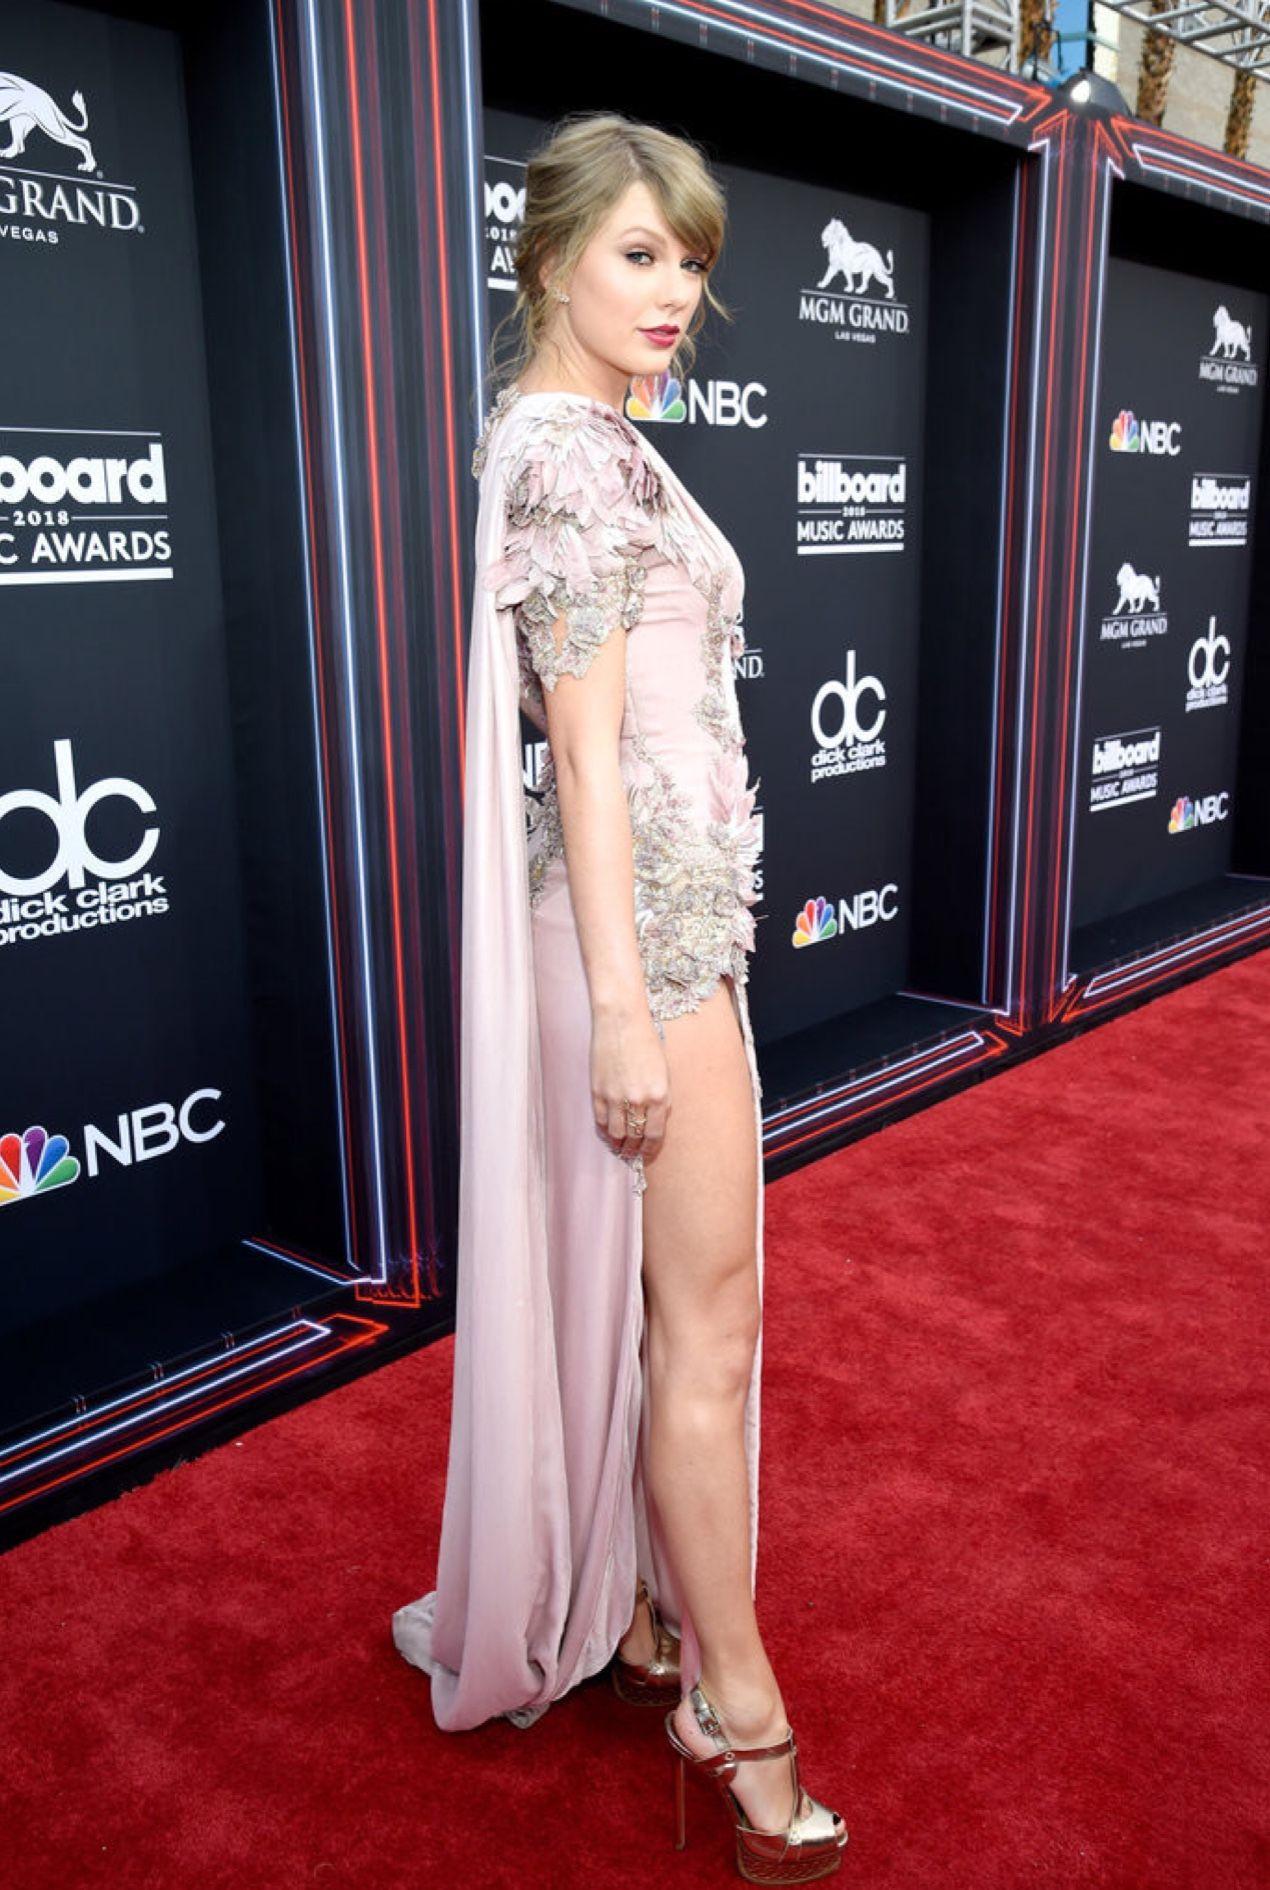 Taylor Swift   Balmain dress, Versace dress, Taylor swift